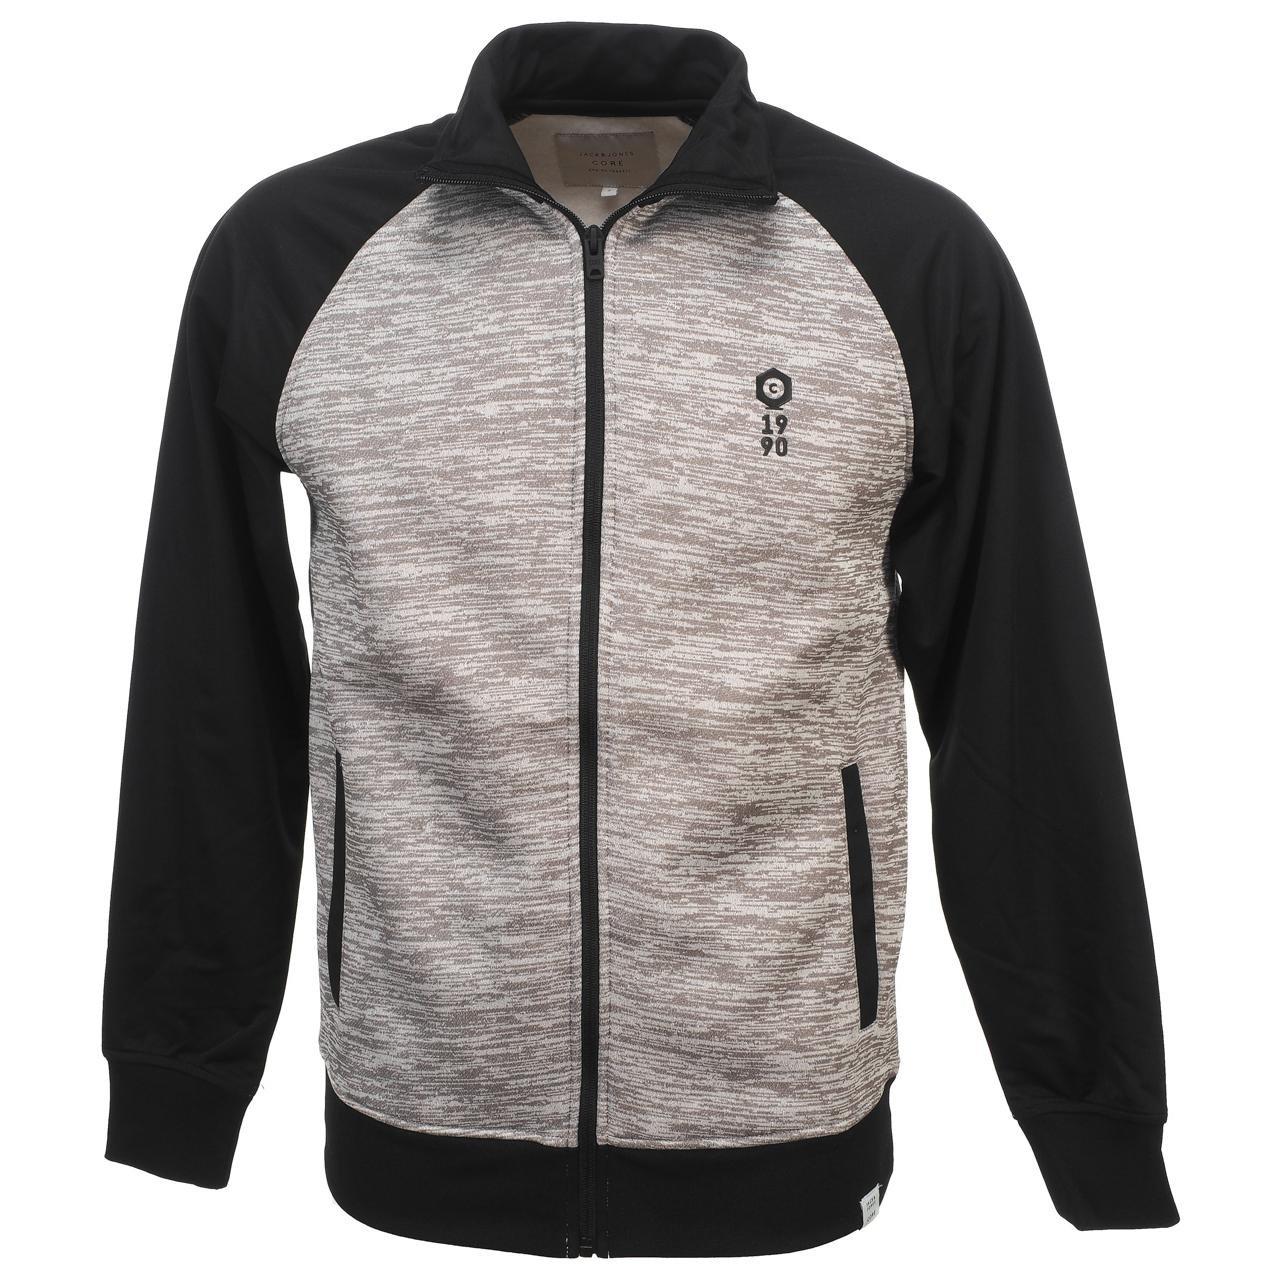 Jack and jones - Boom black fz sweat - Sweats vestes zippée 57150